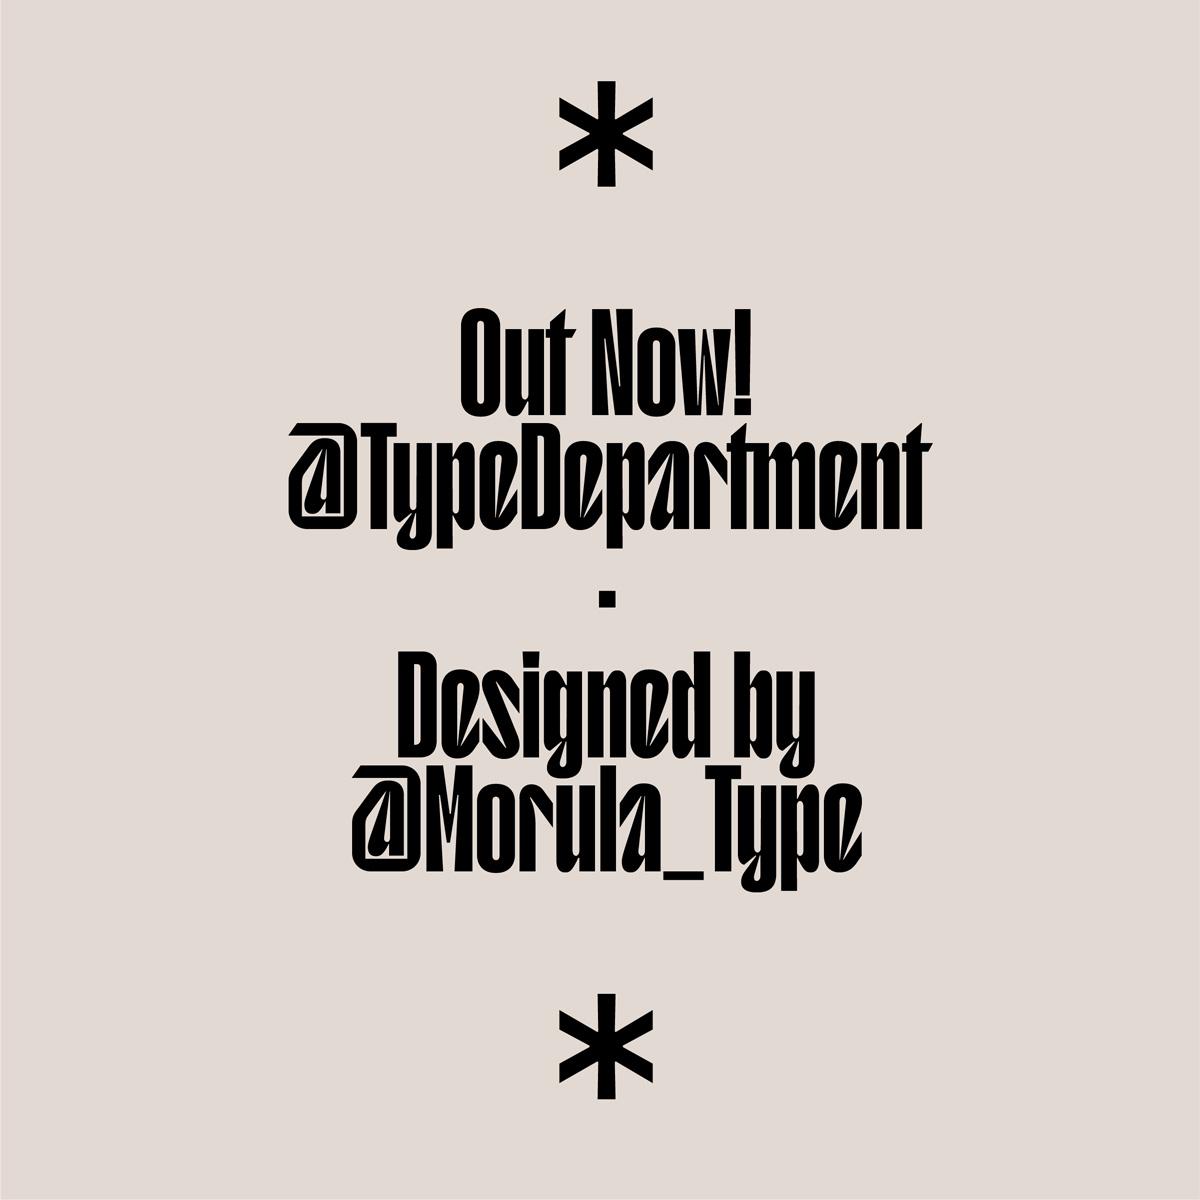 04 collide24 TYPE01 Valerio Monopoli - Valerio Monopoli and TYPE01 release their typeface Korium, a contemporary sans with angular shapes and a badass attitude